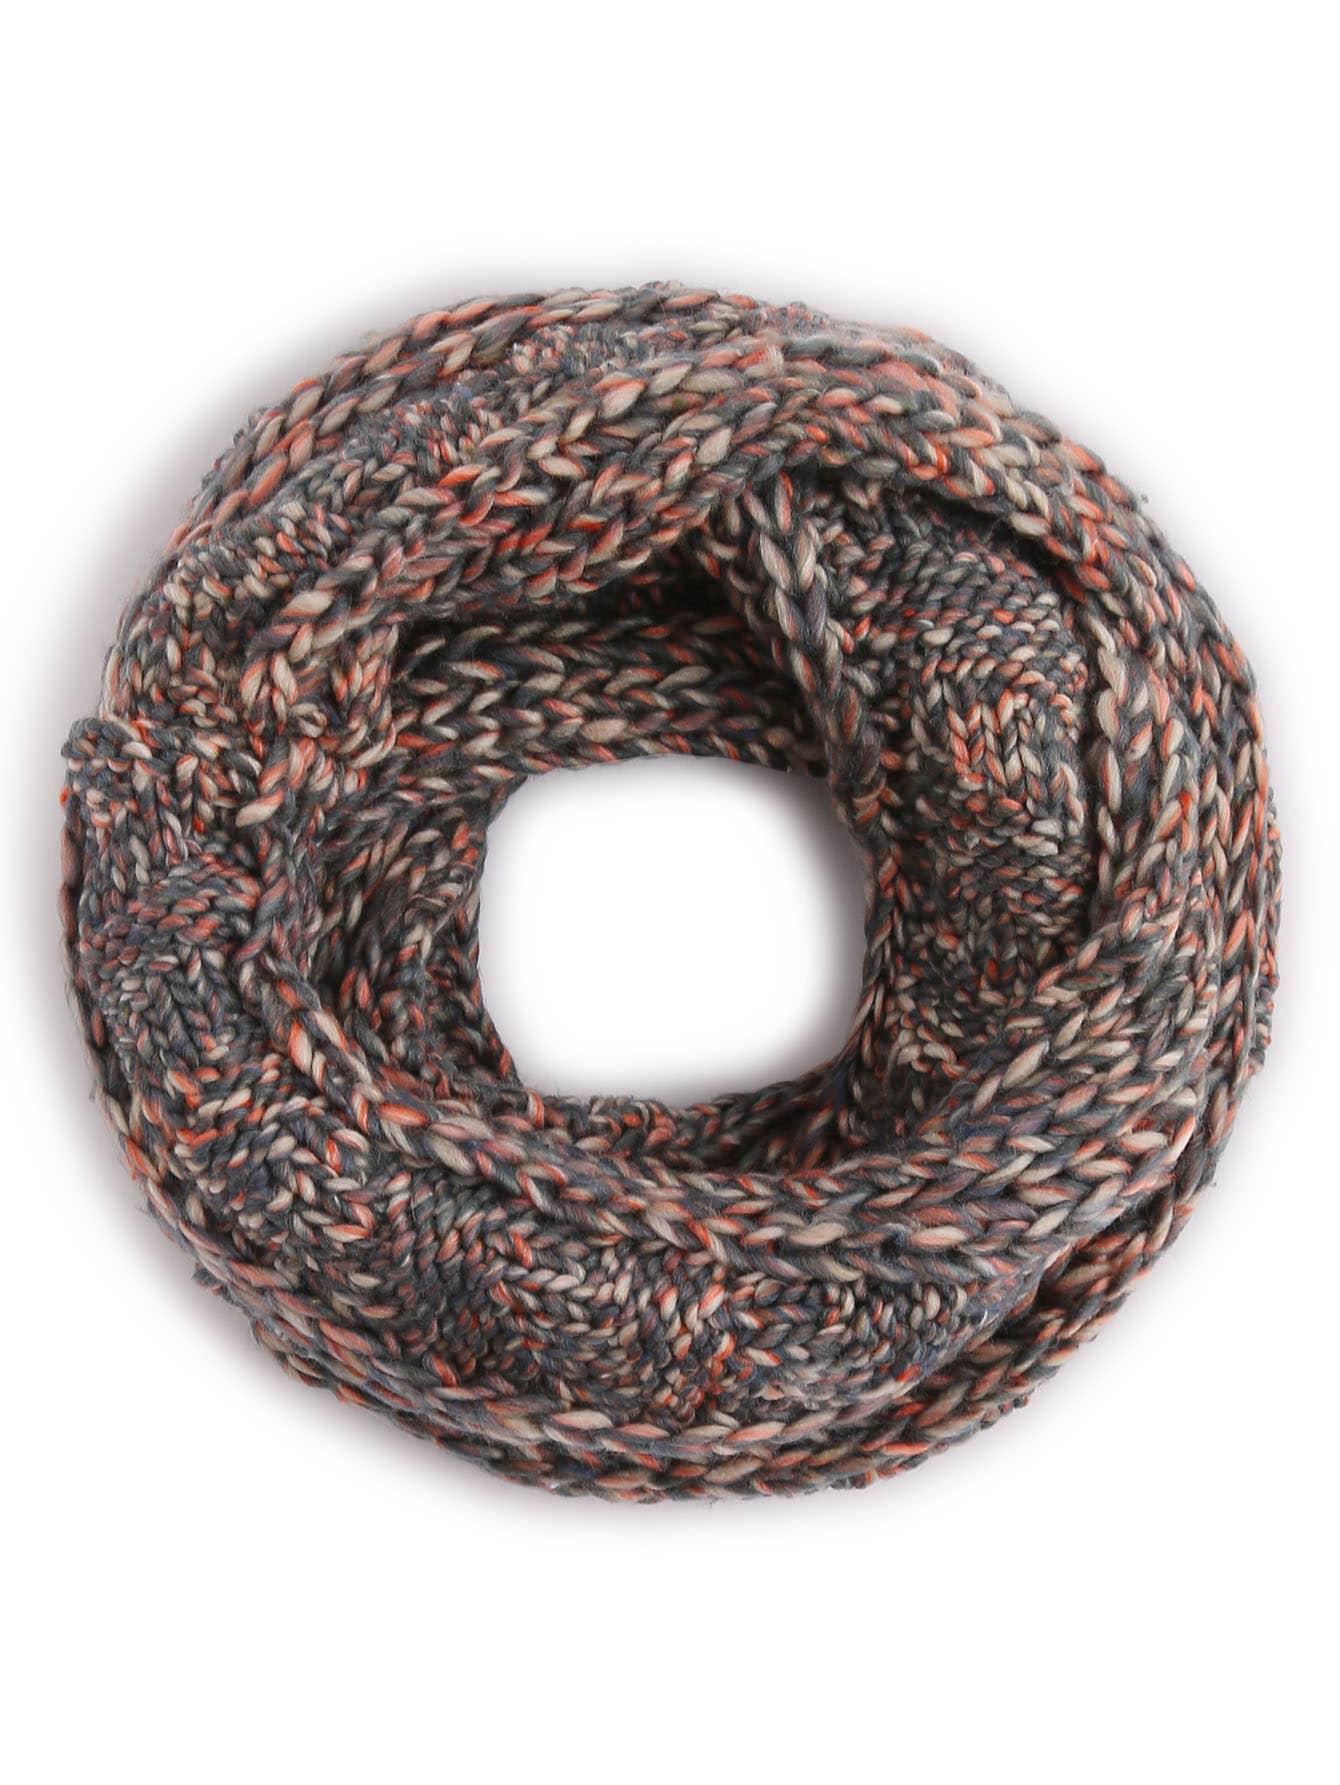 Grey Ribbed Marled Chunky Knit Infinity Scarf scarf161031002